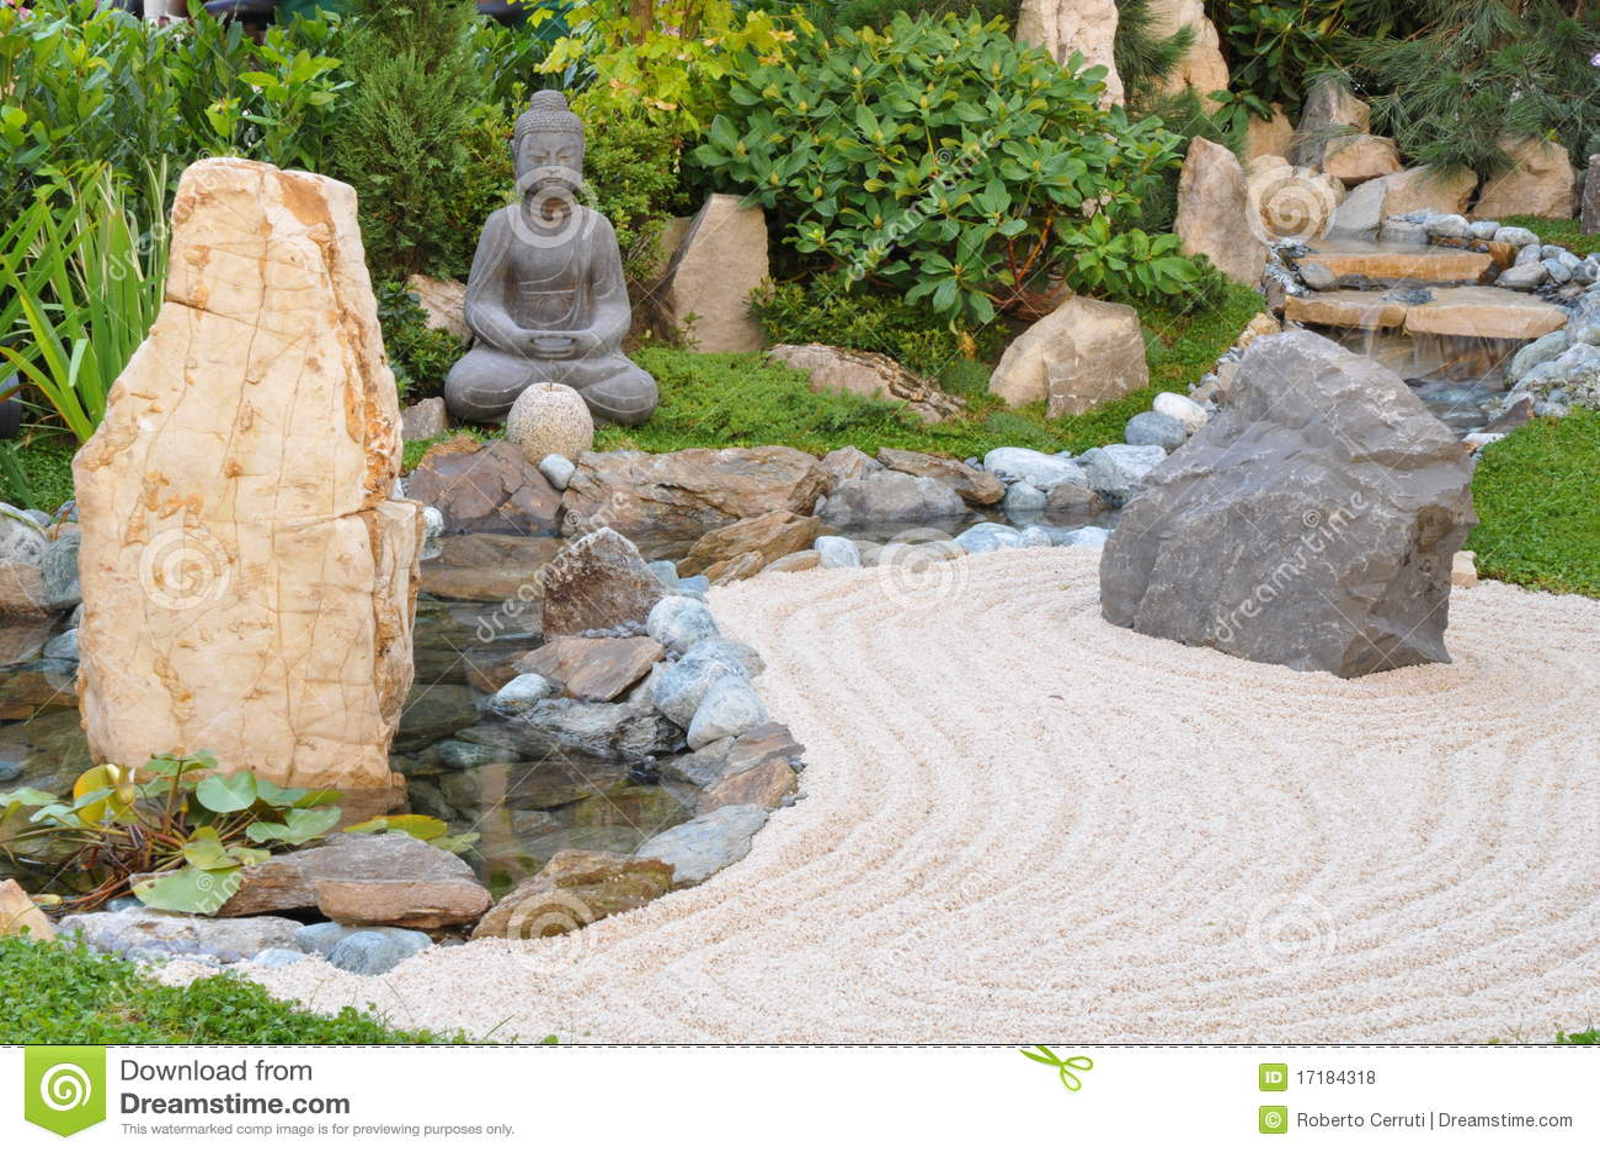 Peque o jard n japon s - Jardin japones pequeno ...